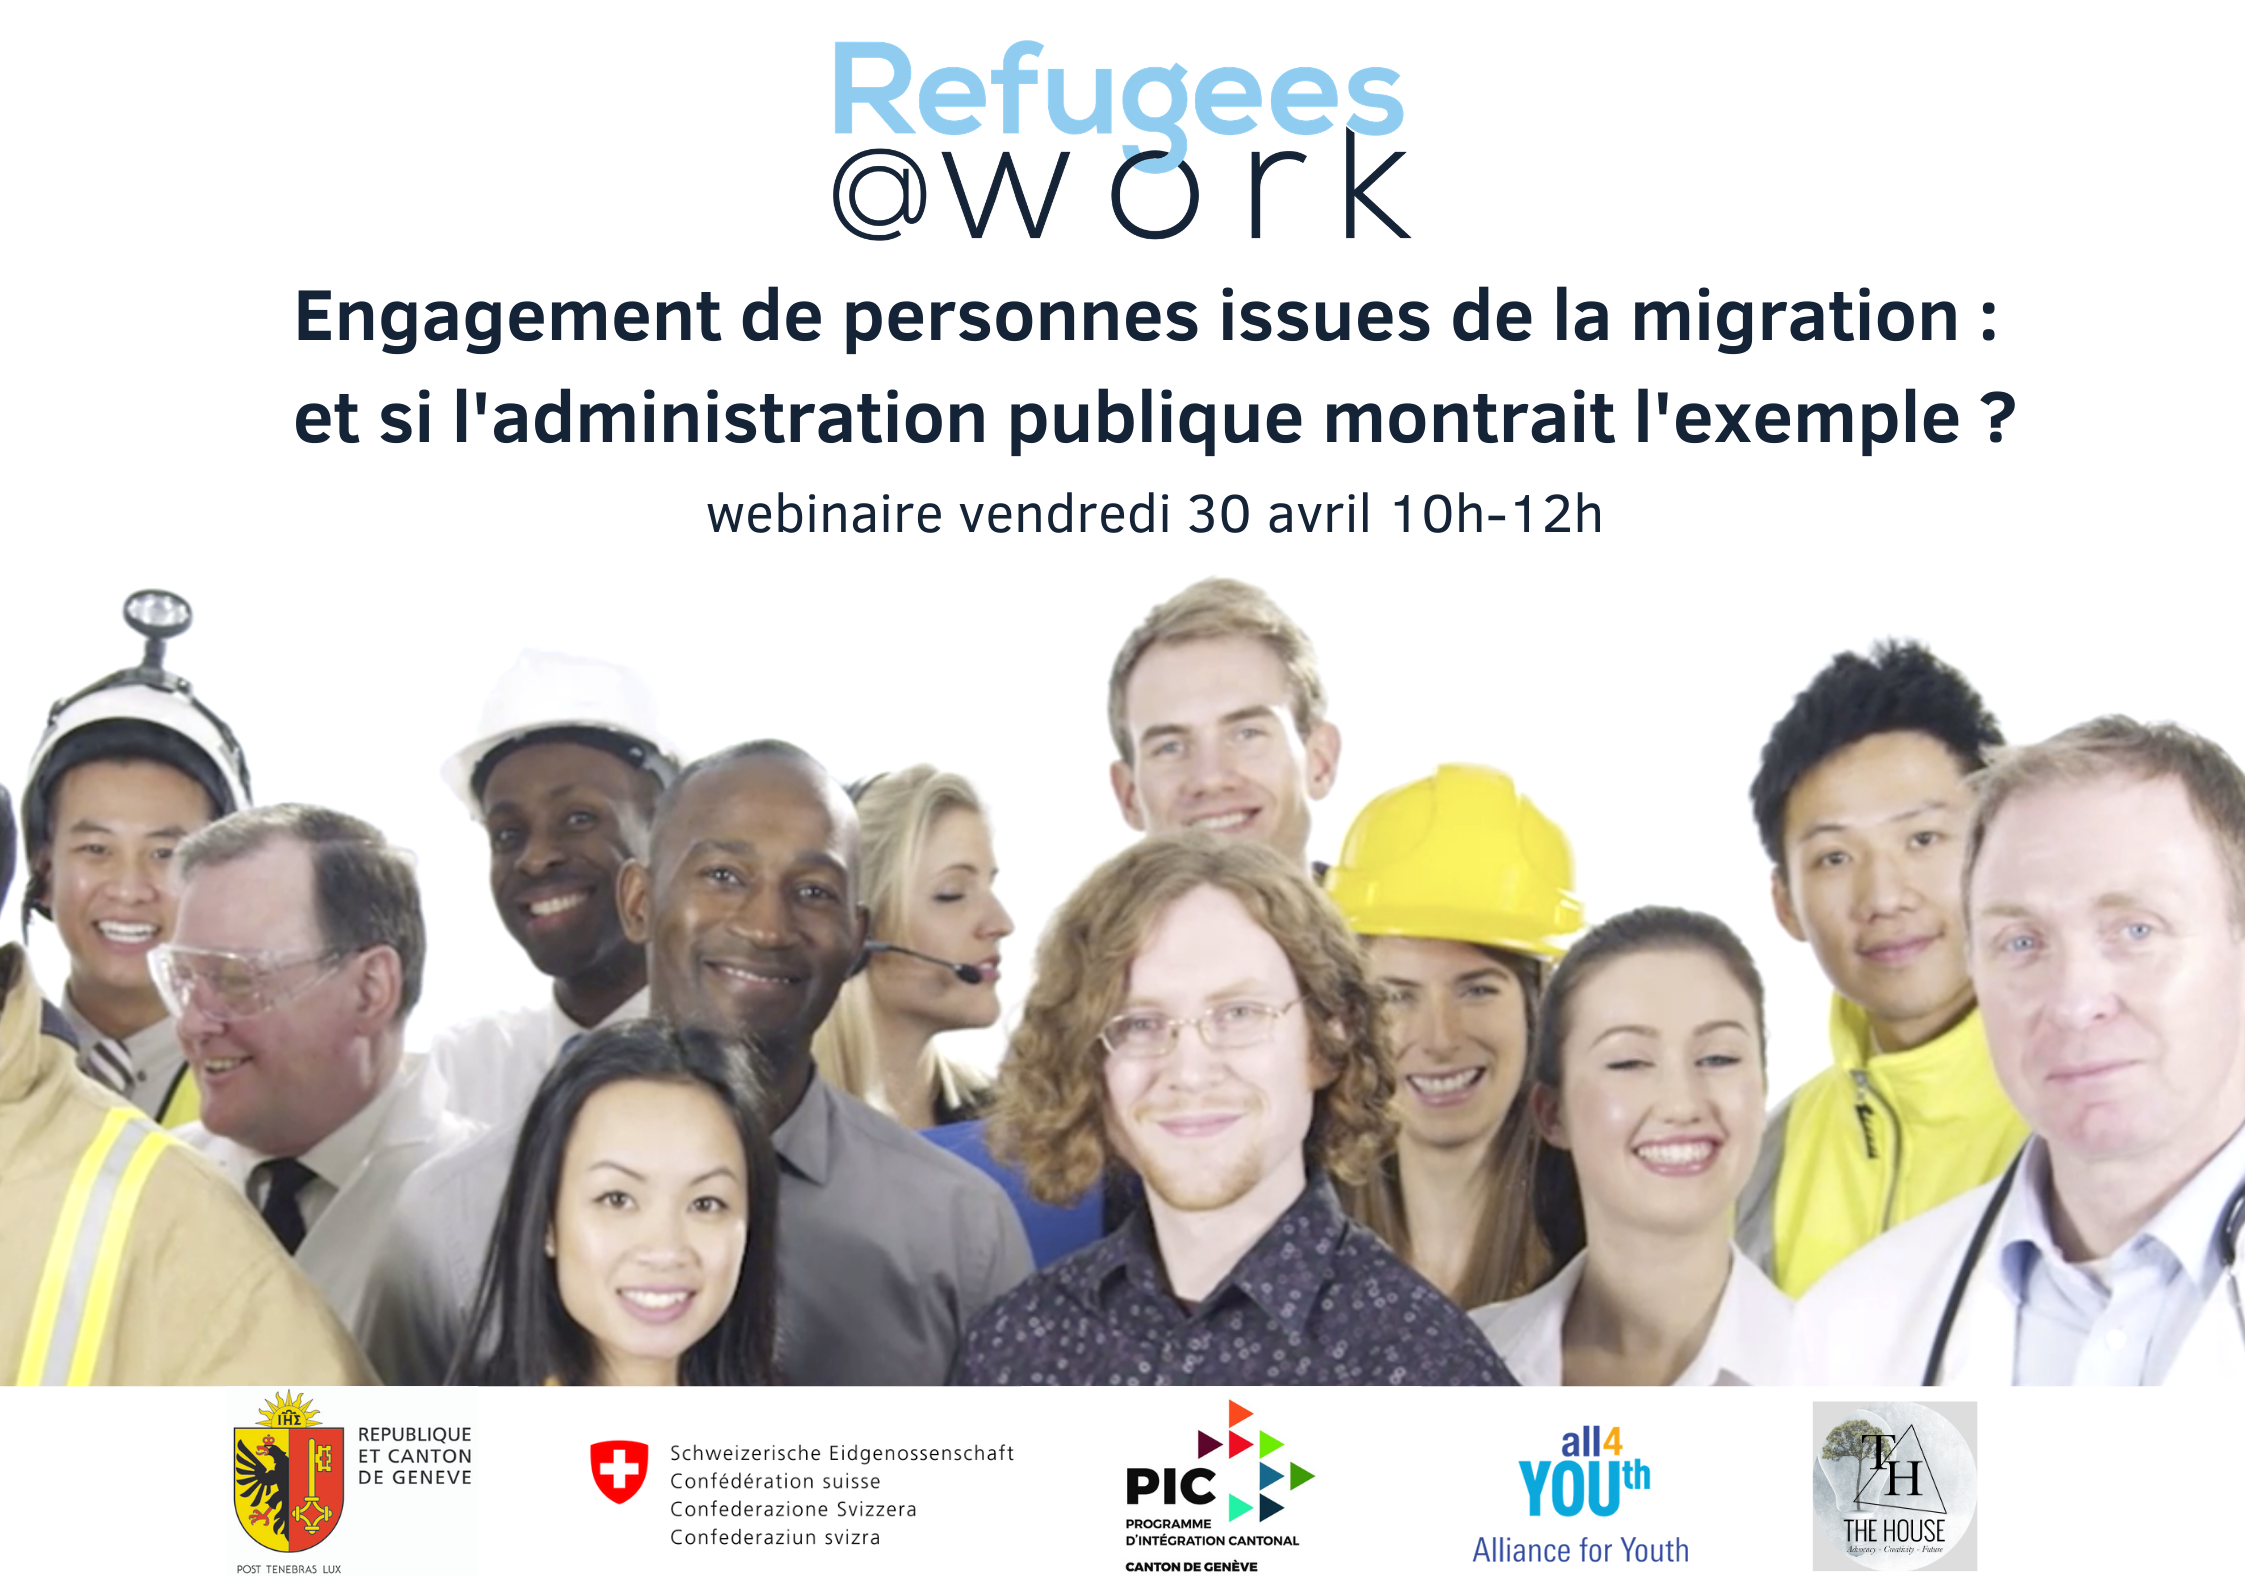 refugees-at-work-30-avril-2021-3fxigabb.png